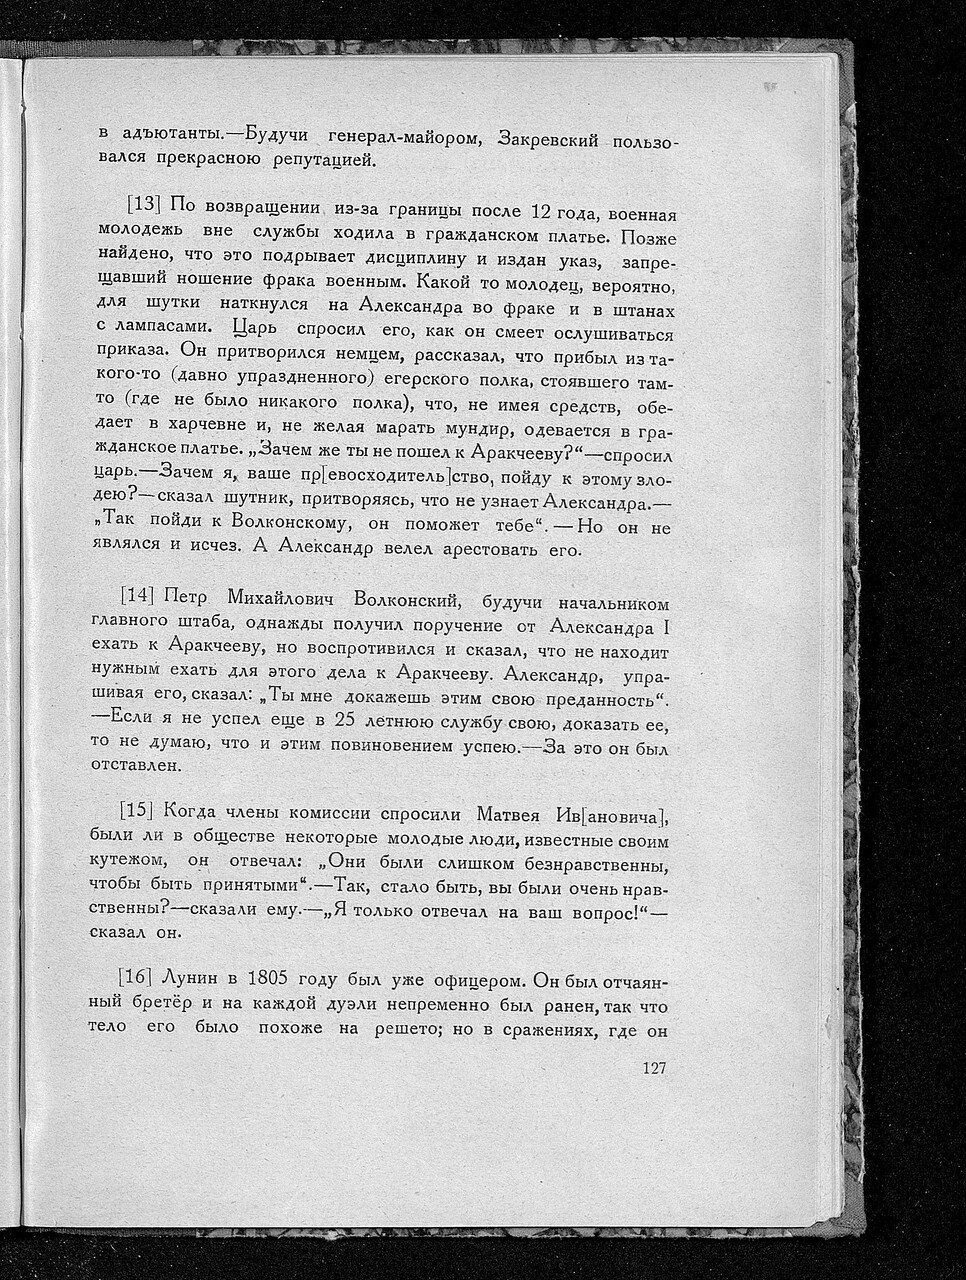 https://img-fotki.yandex.ru/get/9823/199368979.a2/0_214379_5d4dcdd6_XXXL.jpg